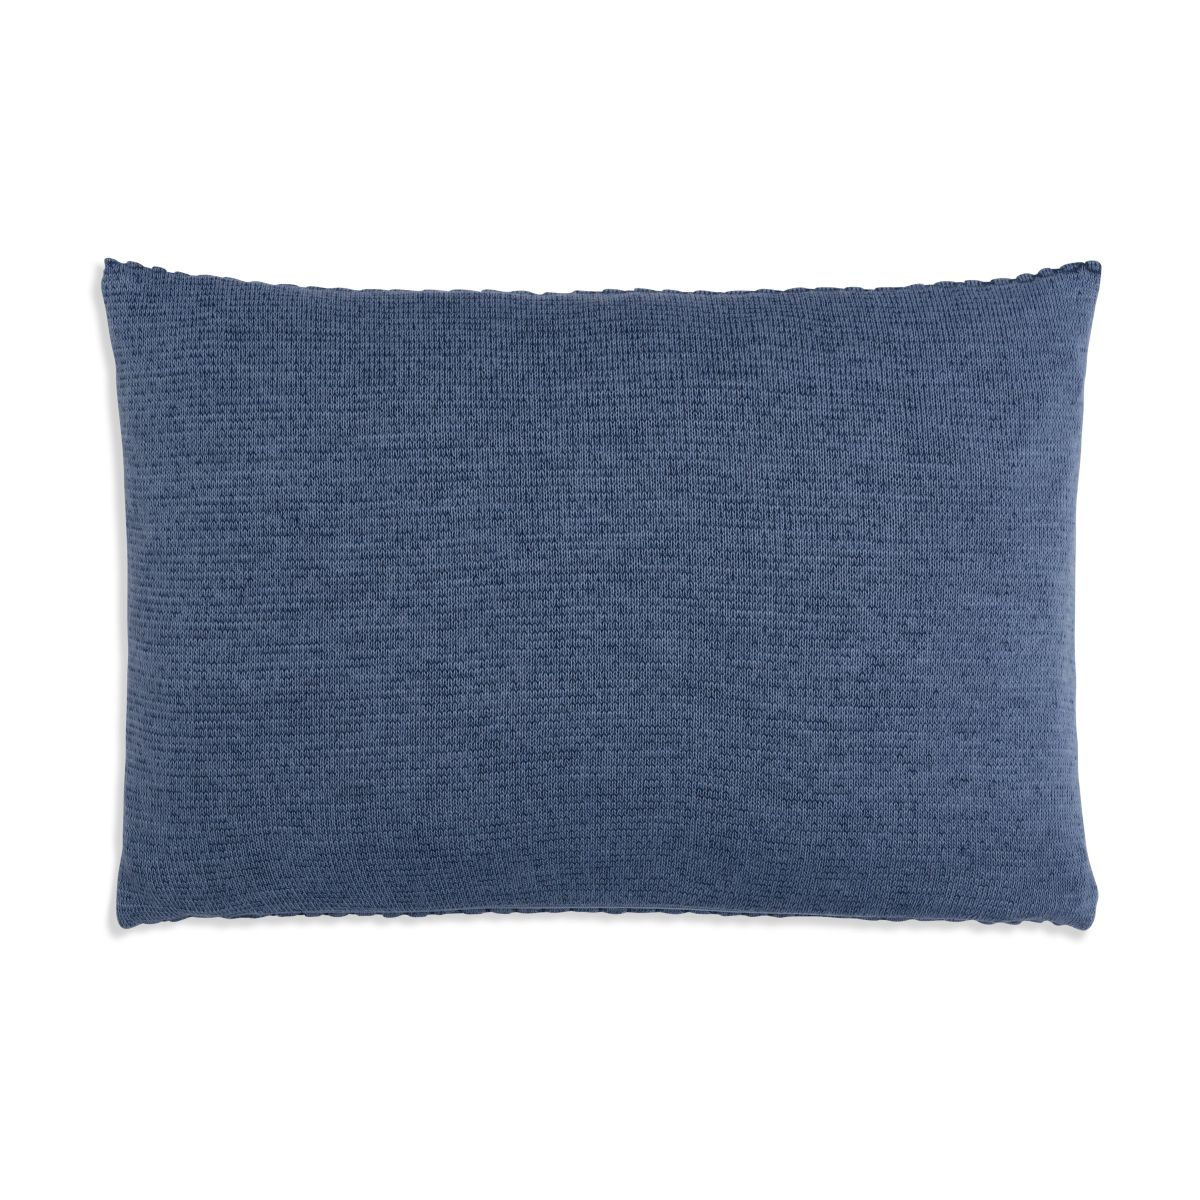 knit factory 1241354 kussen 60x40 juul jeans indigo 2